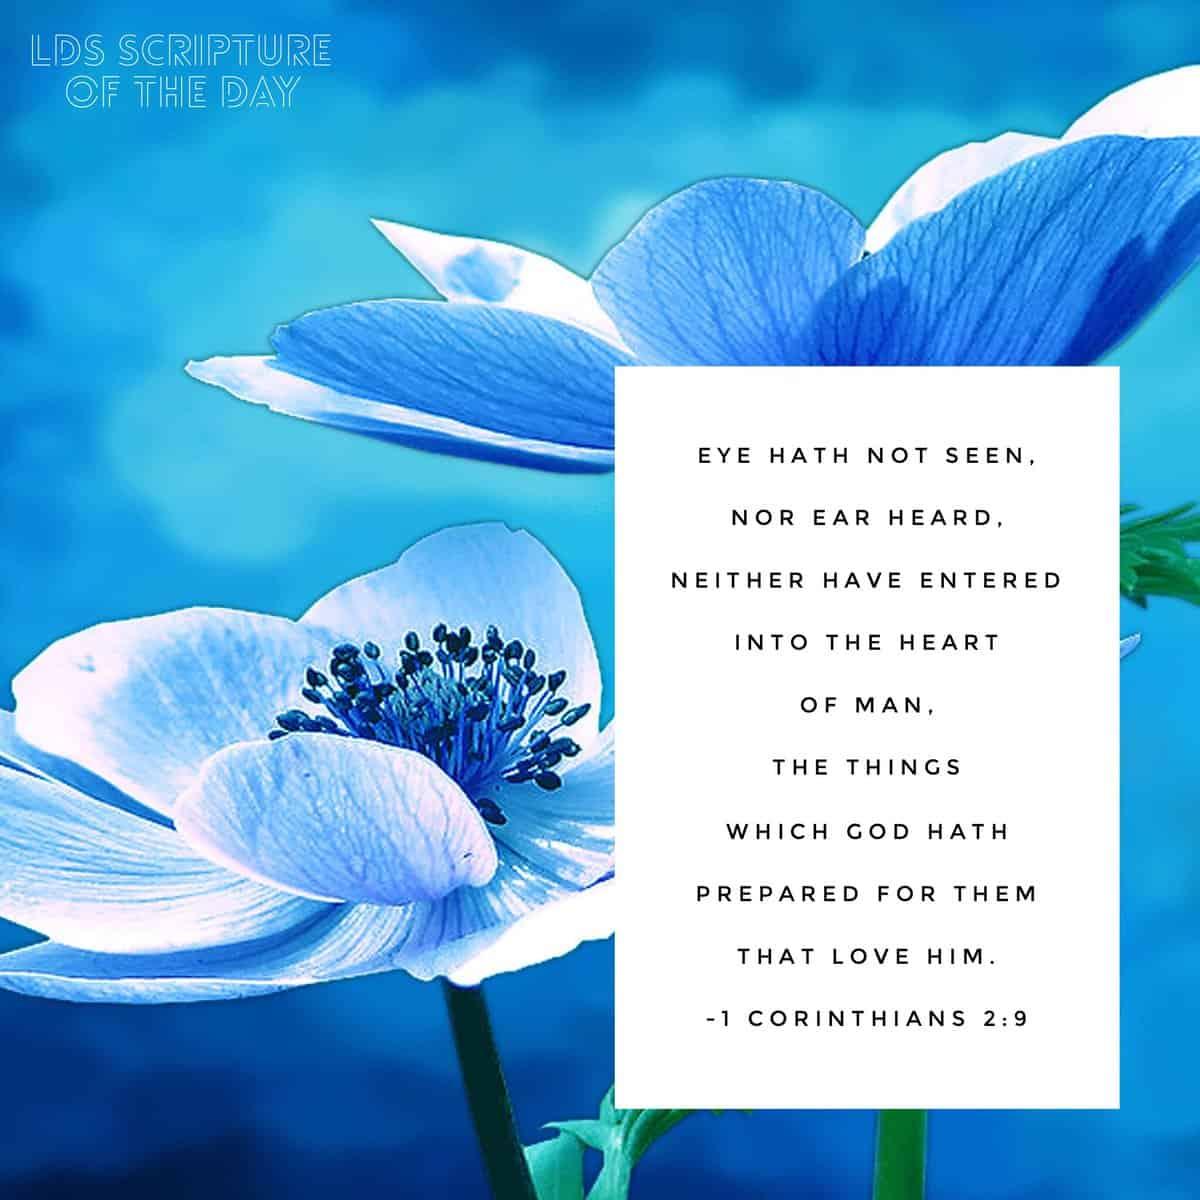 Eye hath not seen, nor ear heard...the things which God hath prepared for them that love him. 1 Corinthians 2:9